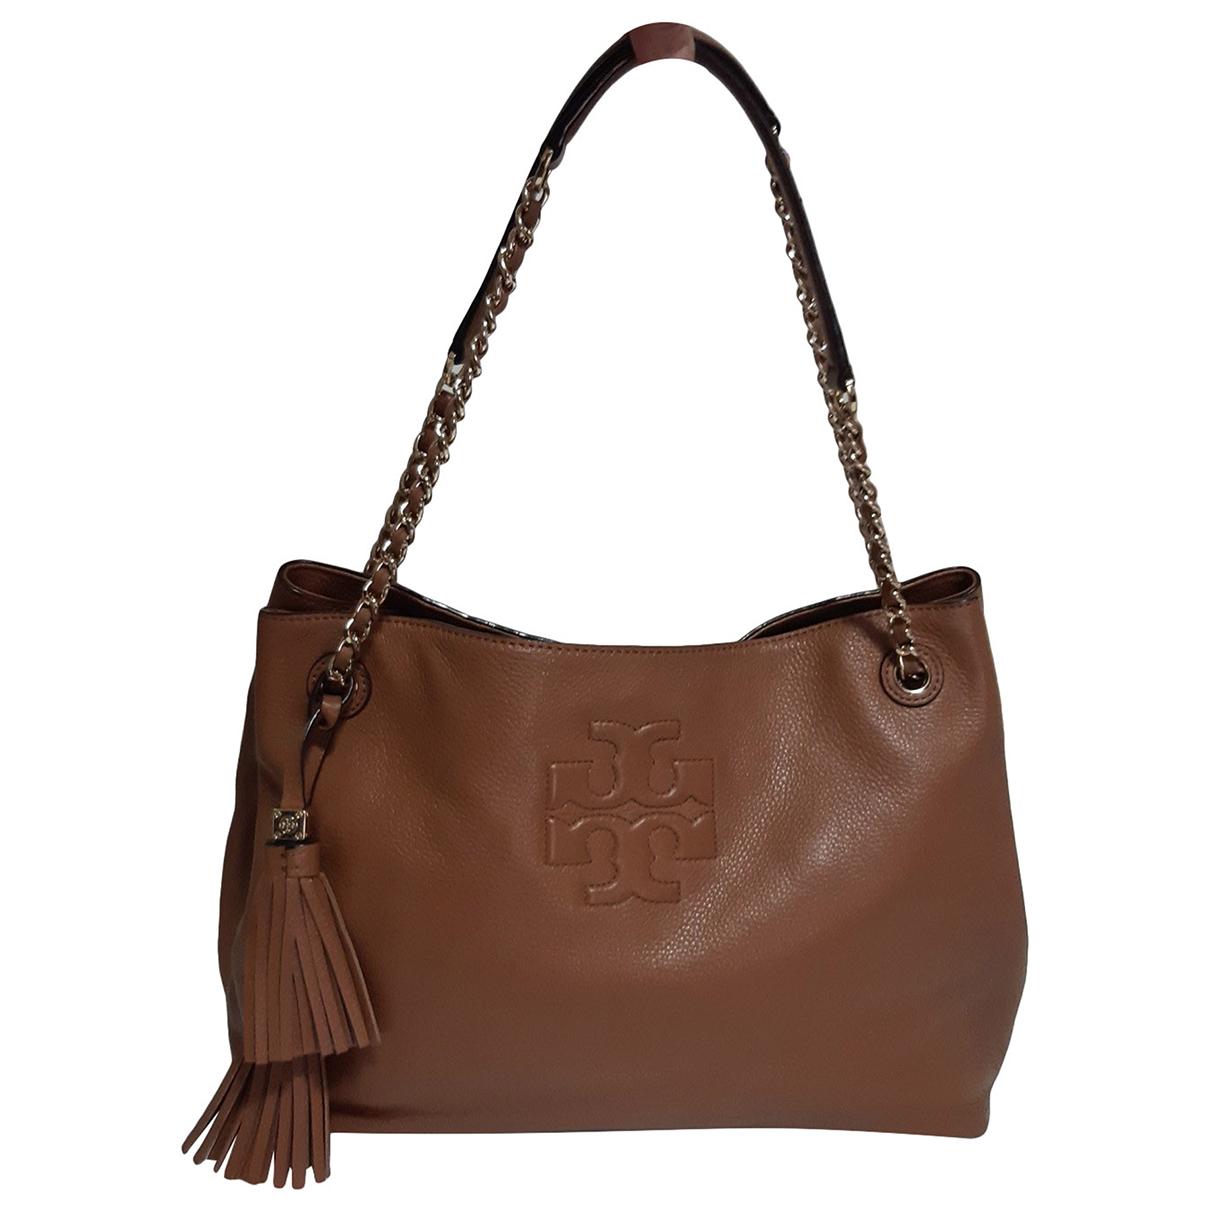 Tory Burch N Camel Leather handbag for Women N